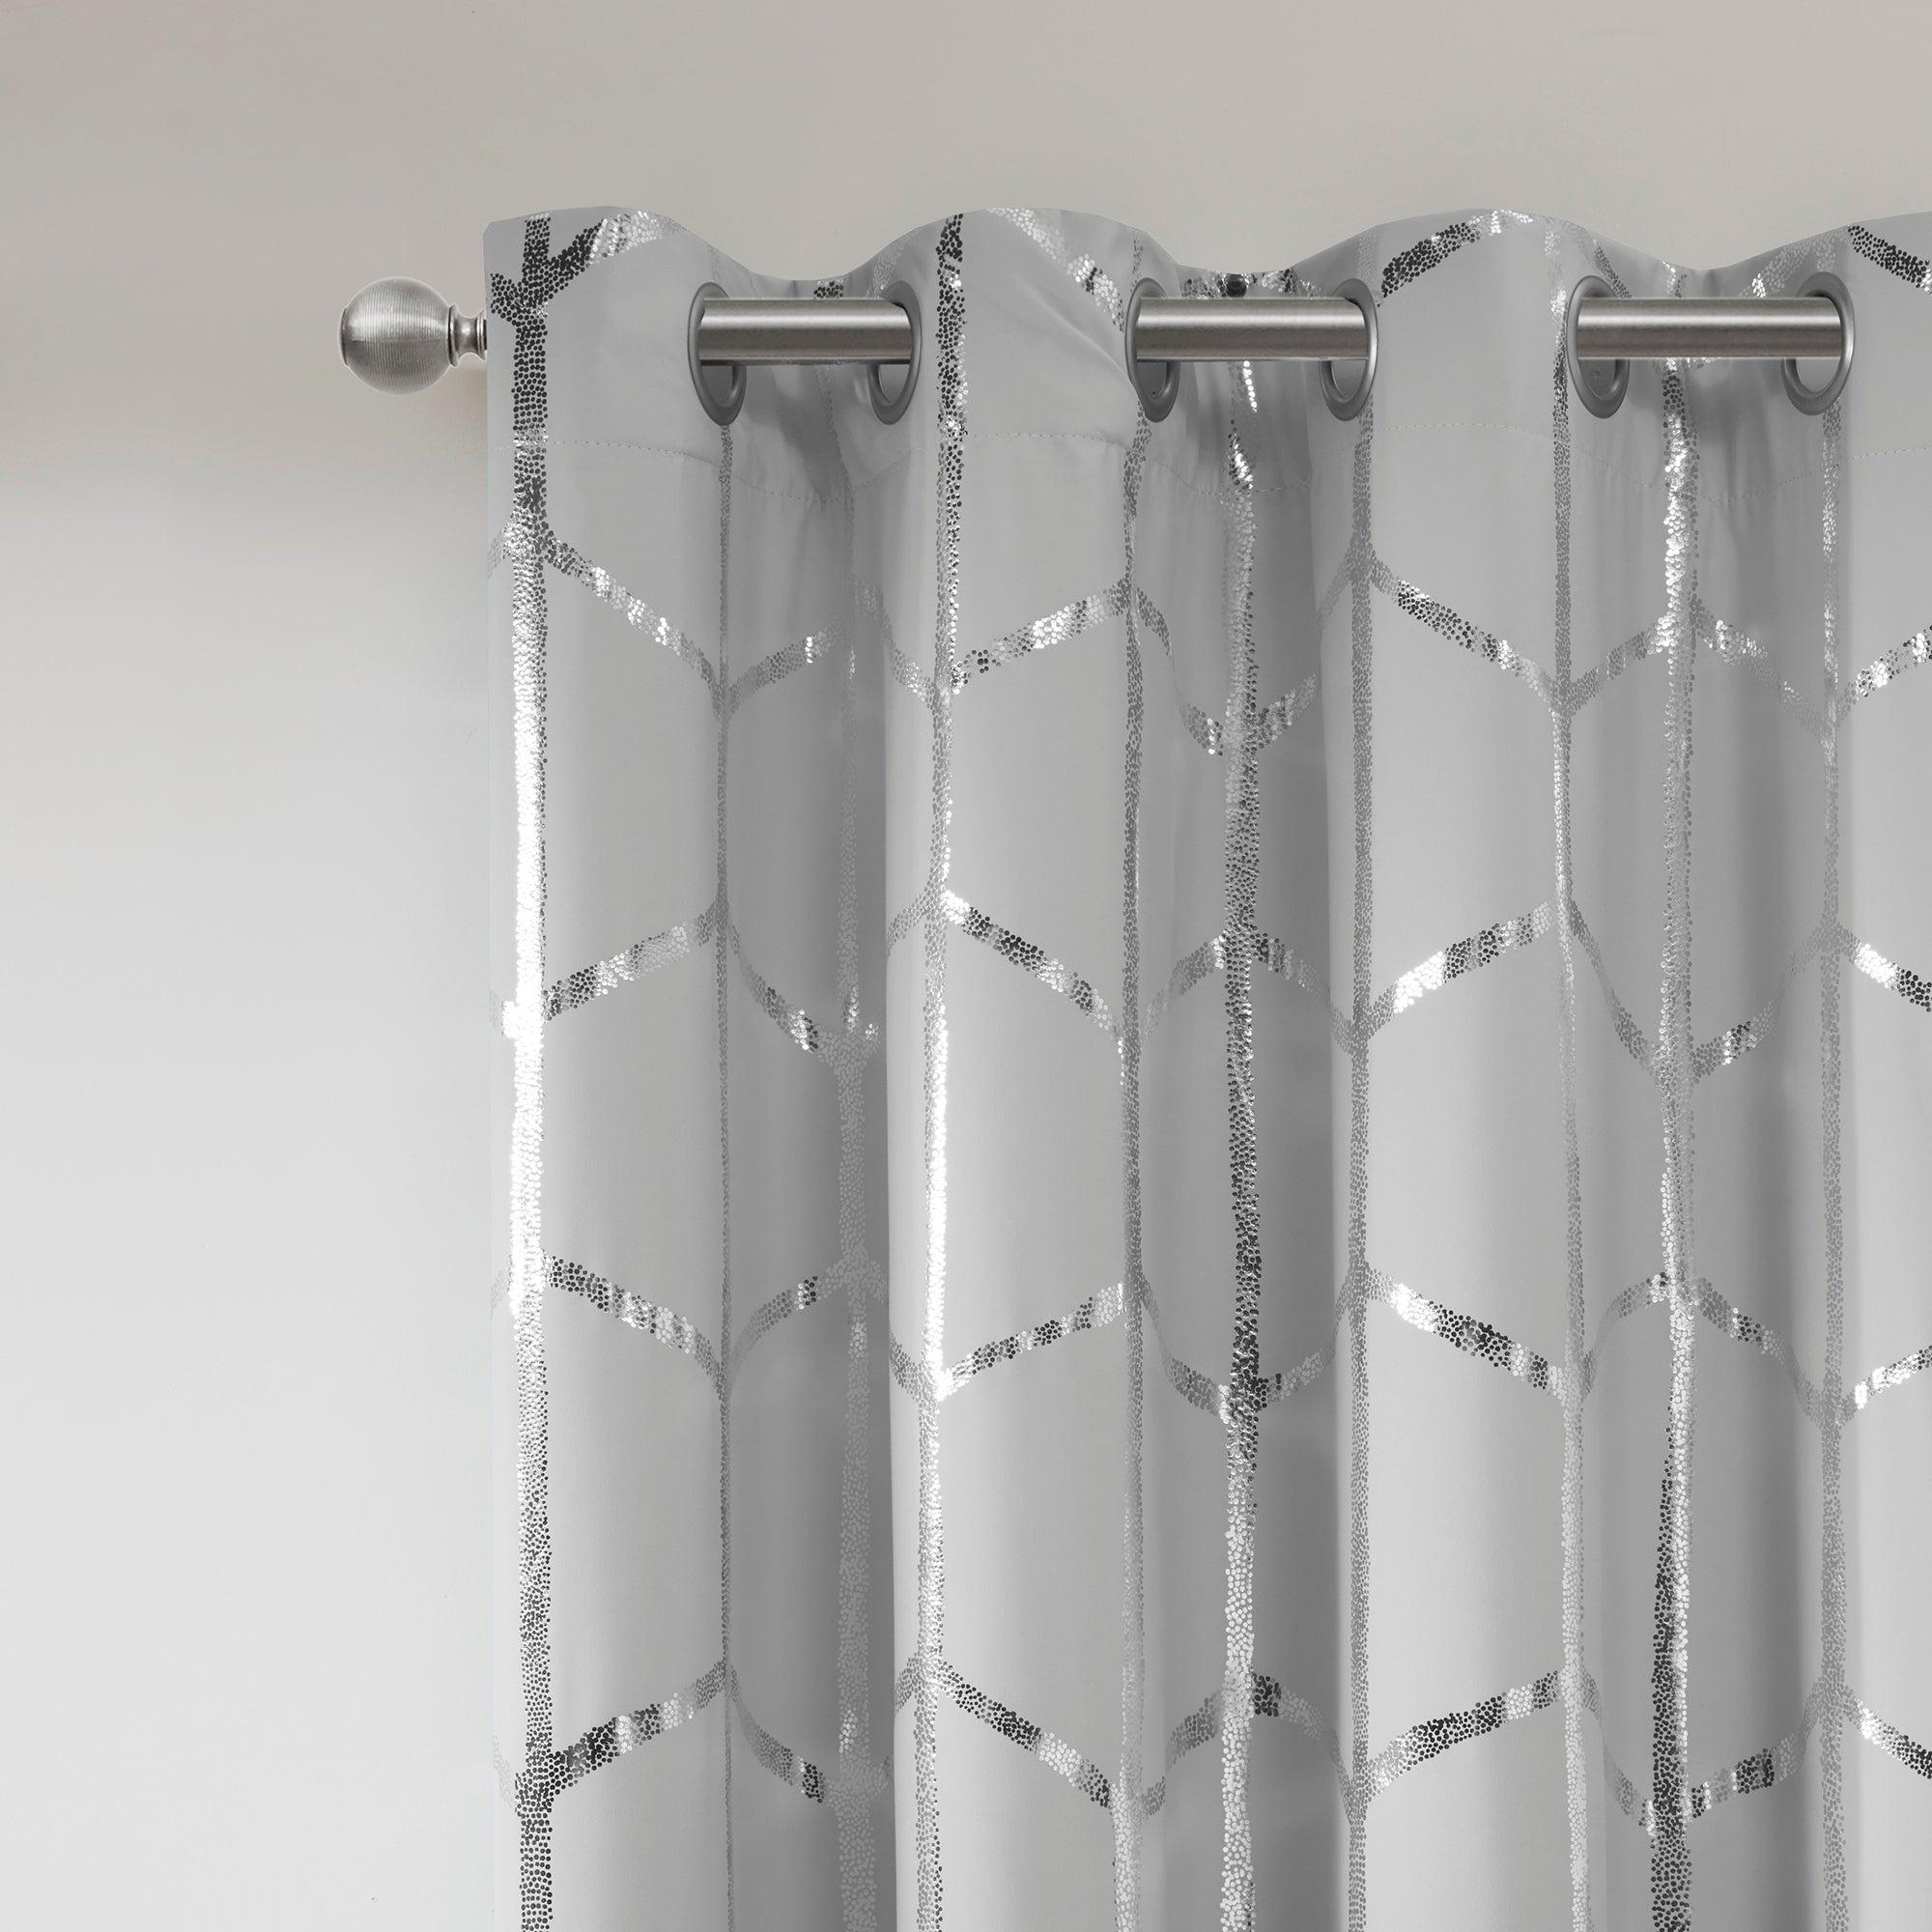 Intelligent Design Khloe Total Blackout Metallic Print Grommet Top Curtain Panel Regarding Total Blackout Metallic Print Grommet Top Curtain Panels (View 8 of 36)